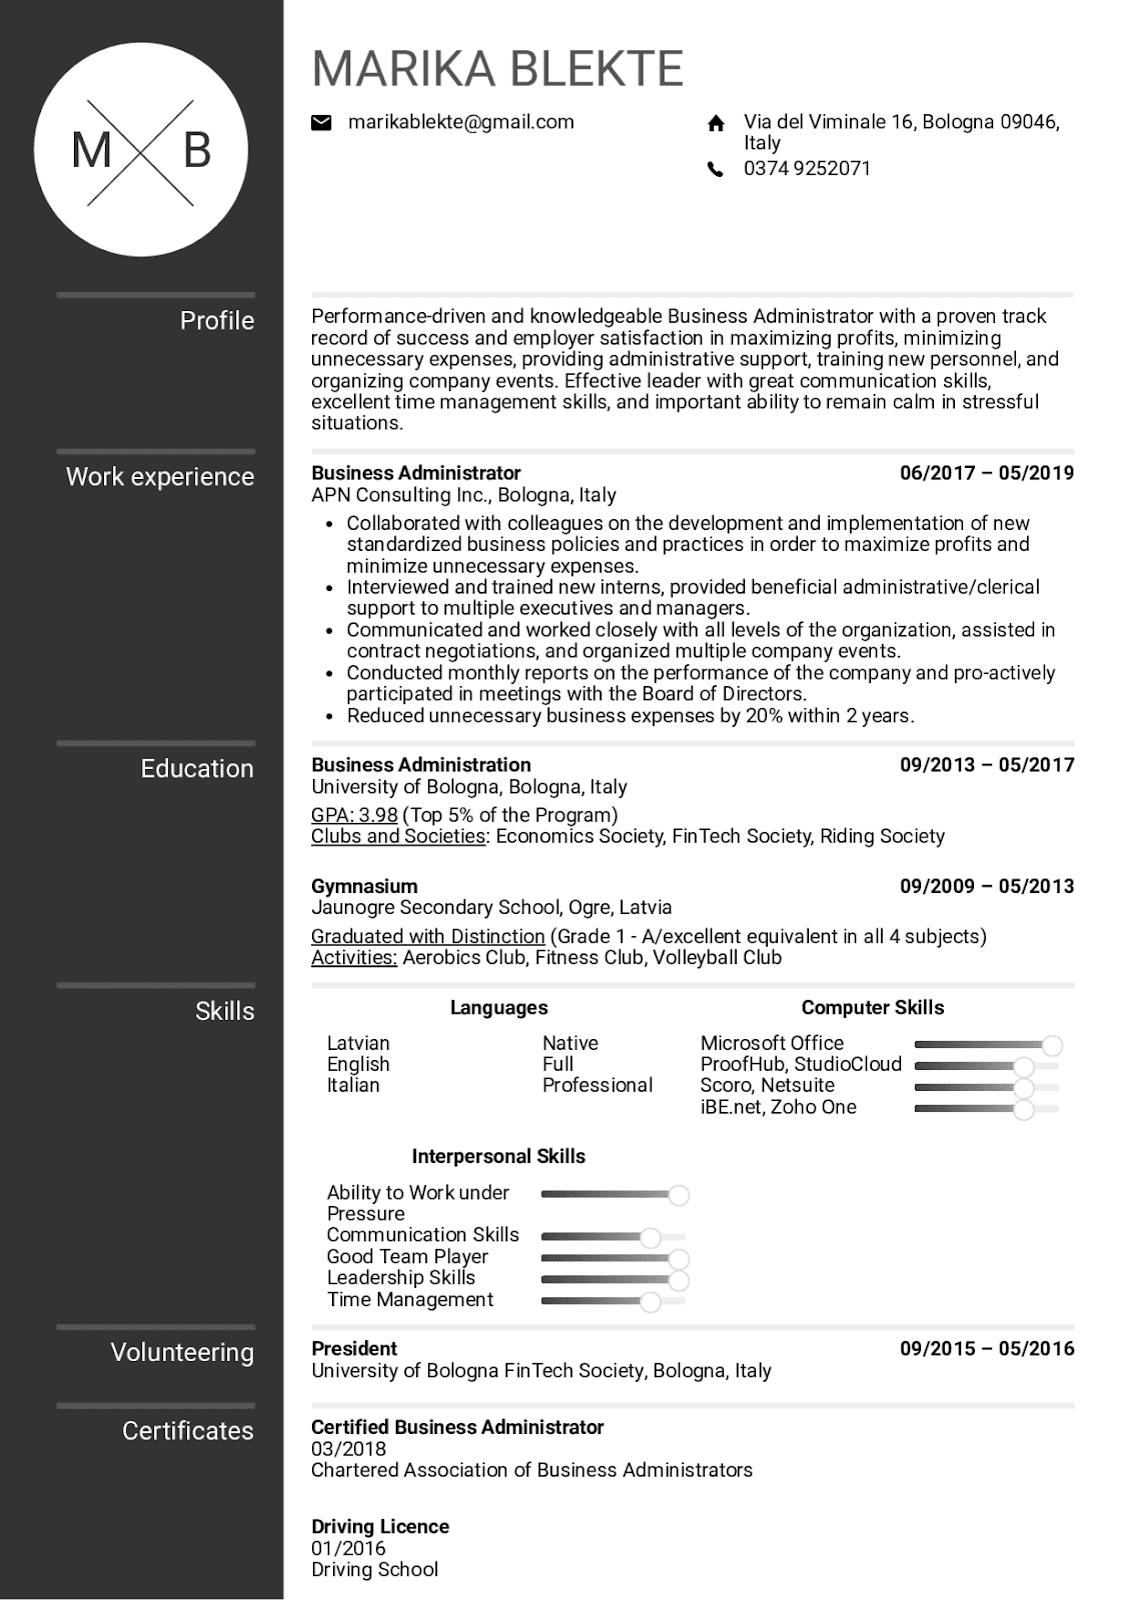 administrator resume sample, administrator resume sample doc, administrator resume sample india, administrator cv sample, system administrator resume sample network administrator resume sample database administrator resume sample linux administrator resume sample business administrator resume sample administrator cv sample doc administrator cv